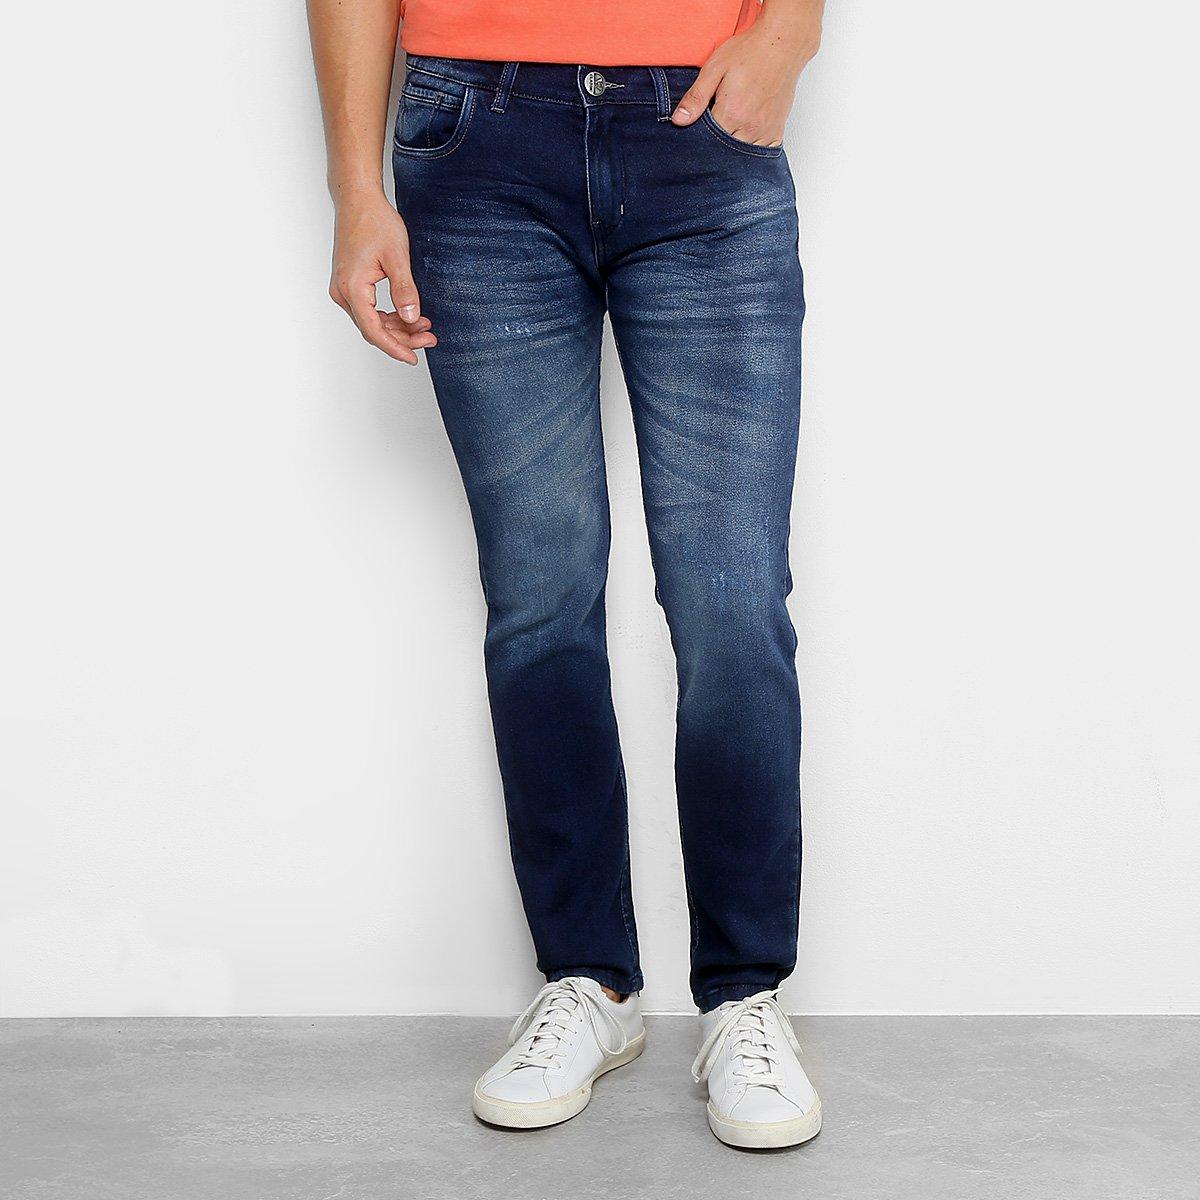 a7406b594 Calça Jeans Reta Preston Feminina